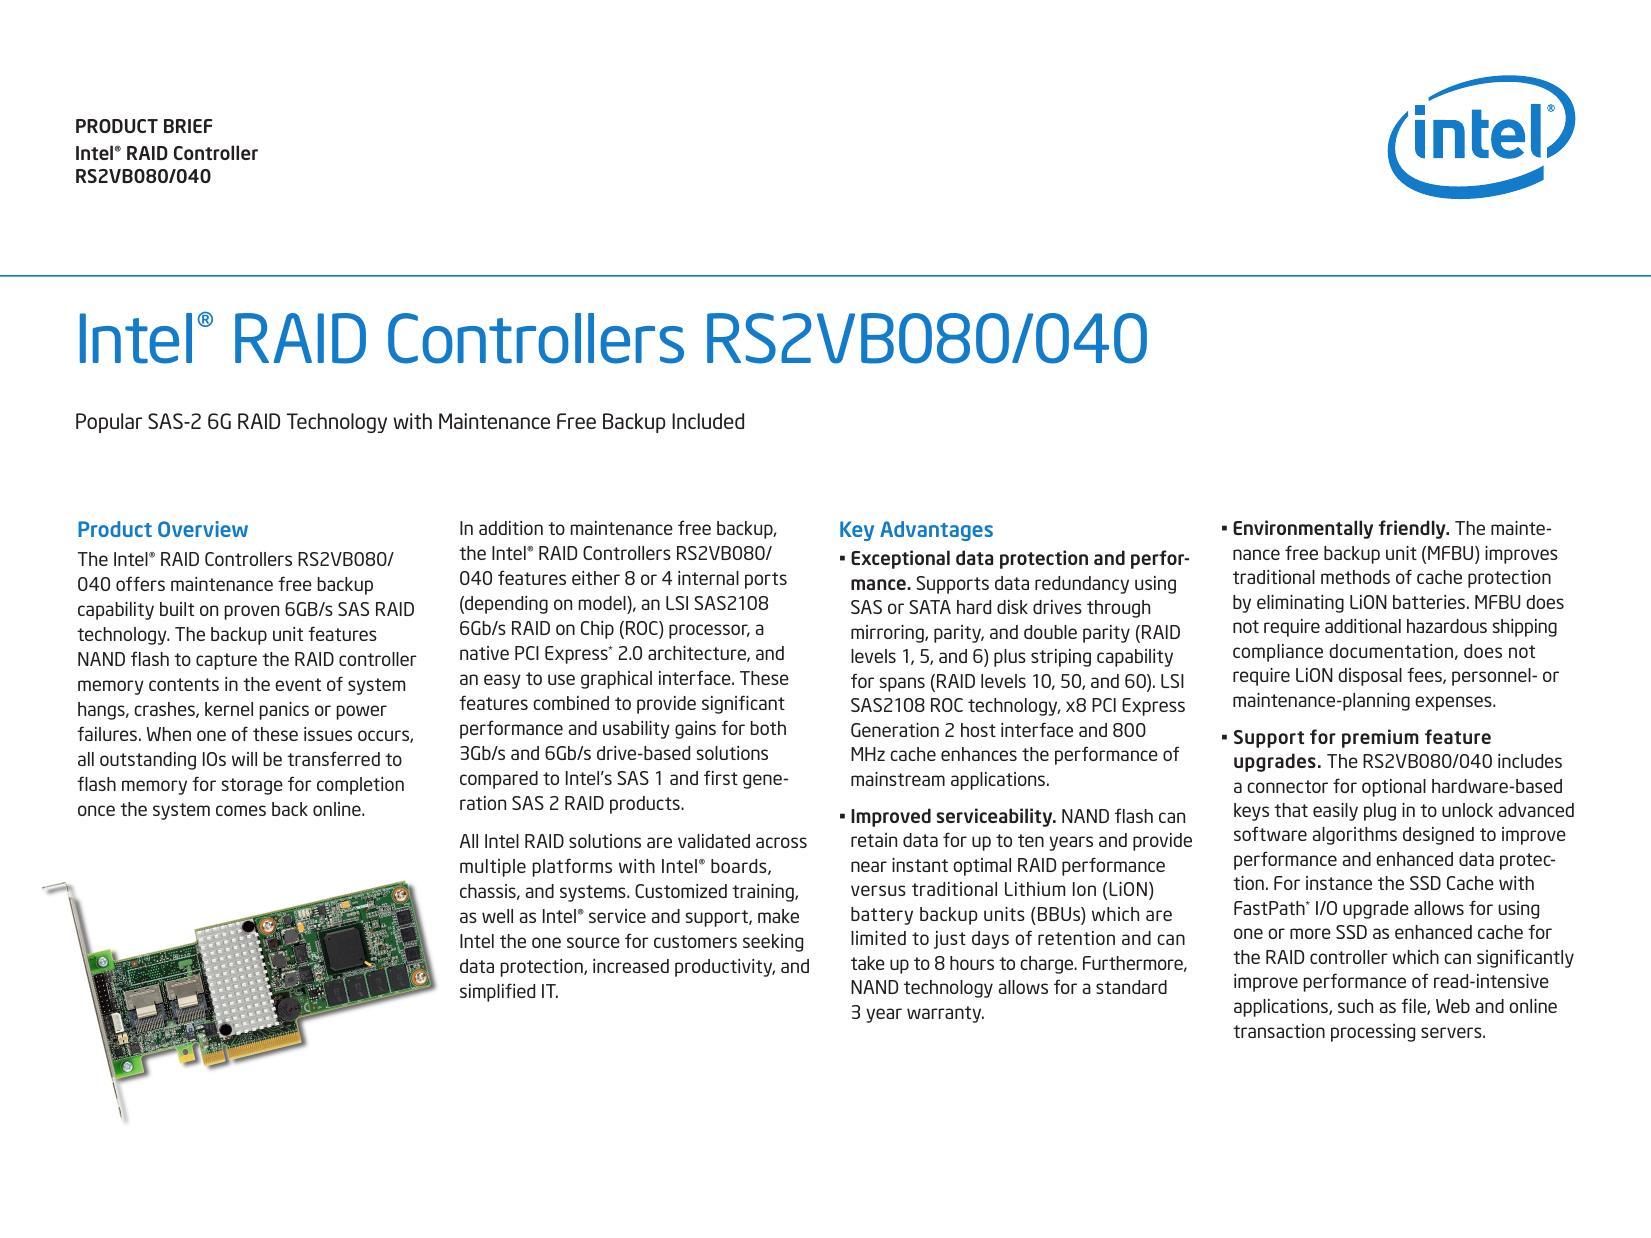 Intel RAID Controller RS2VB080/040 Product Brief 318036 | manualzz com